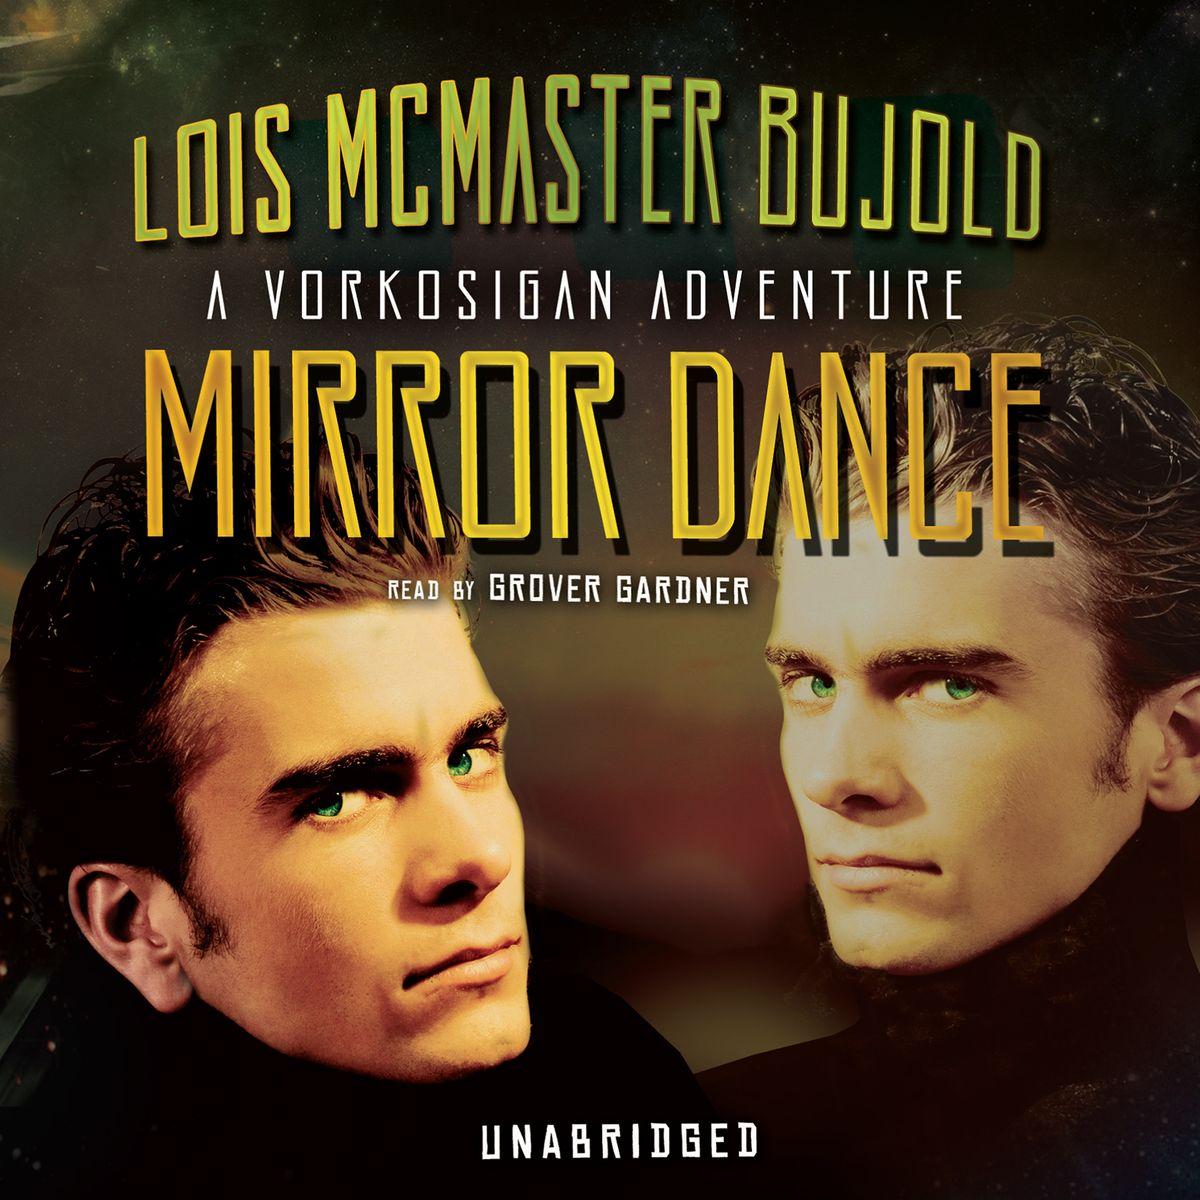 Mirror Dance Lois McMaster Bujold